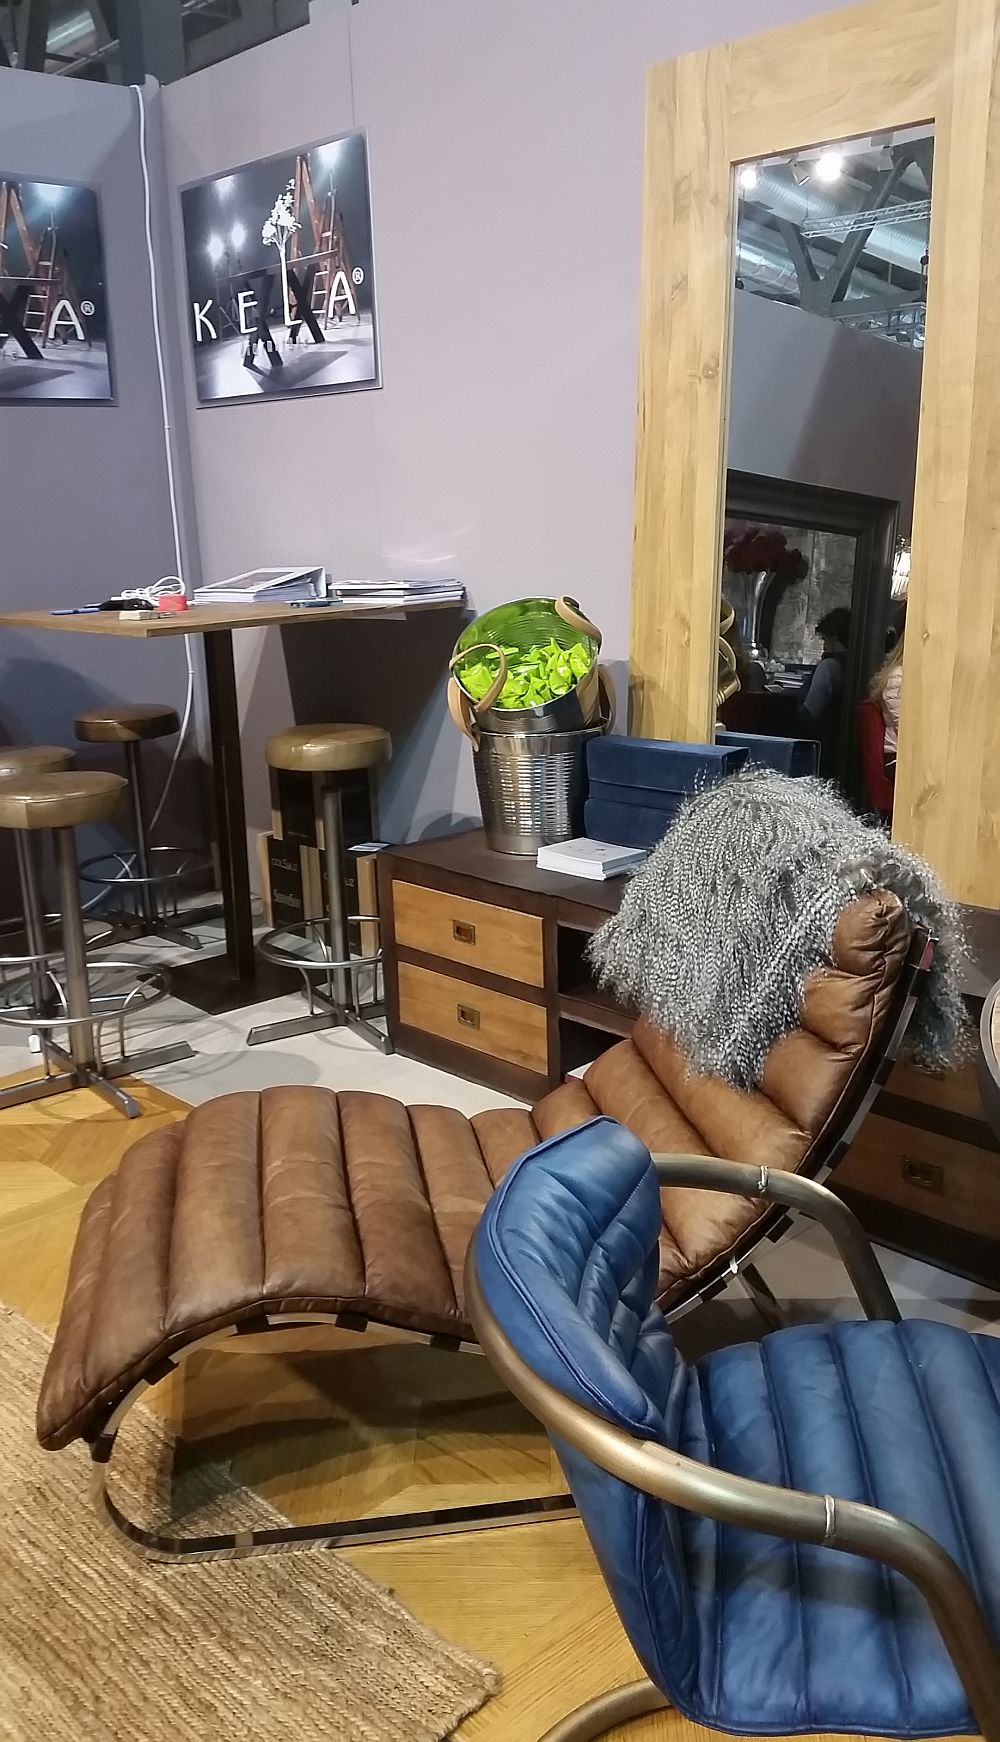 adelaparvu.com despre firme romanesti de mobila la Salone del Mobile Milano 2016, stand Kela (2)